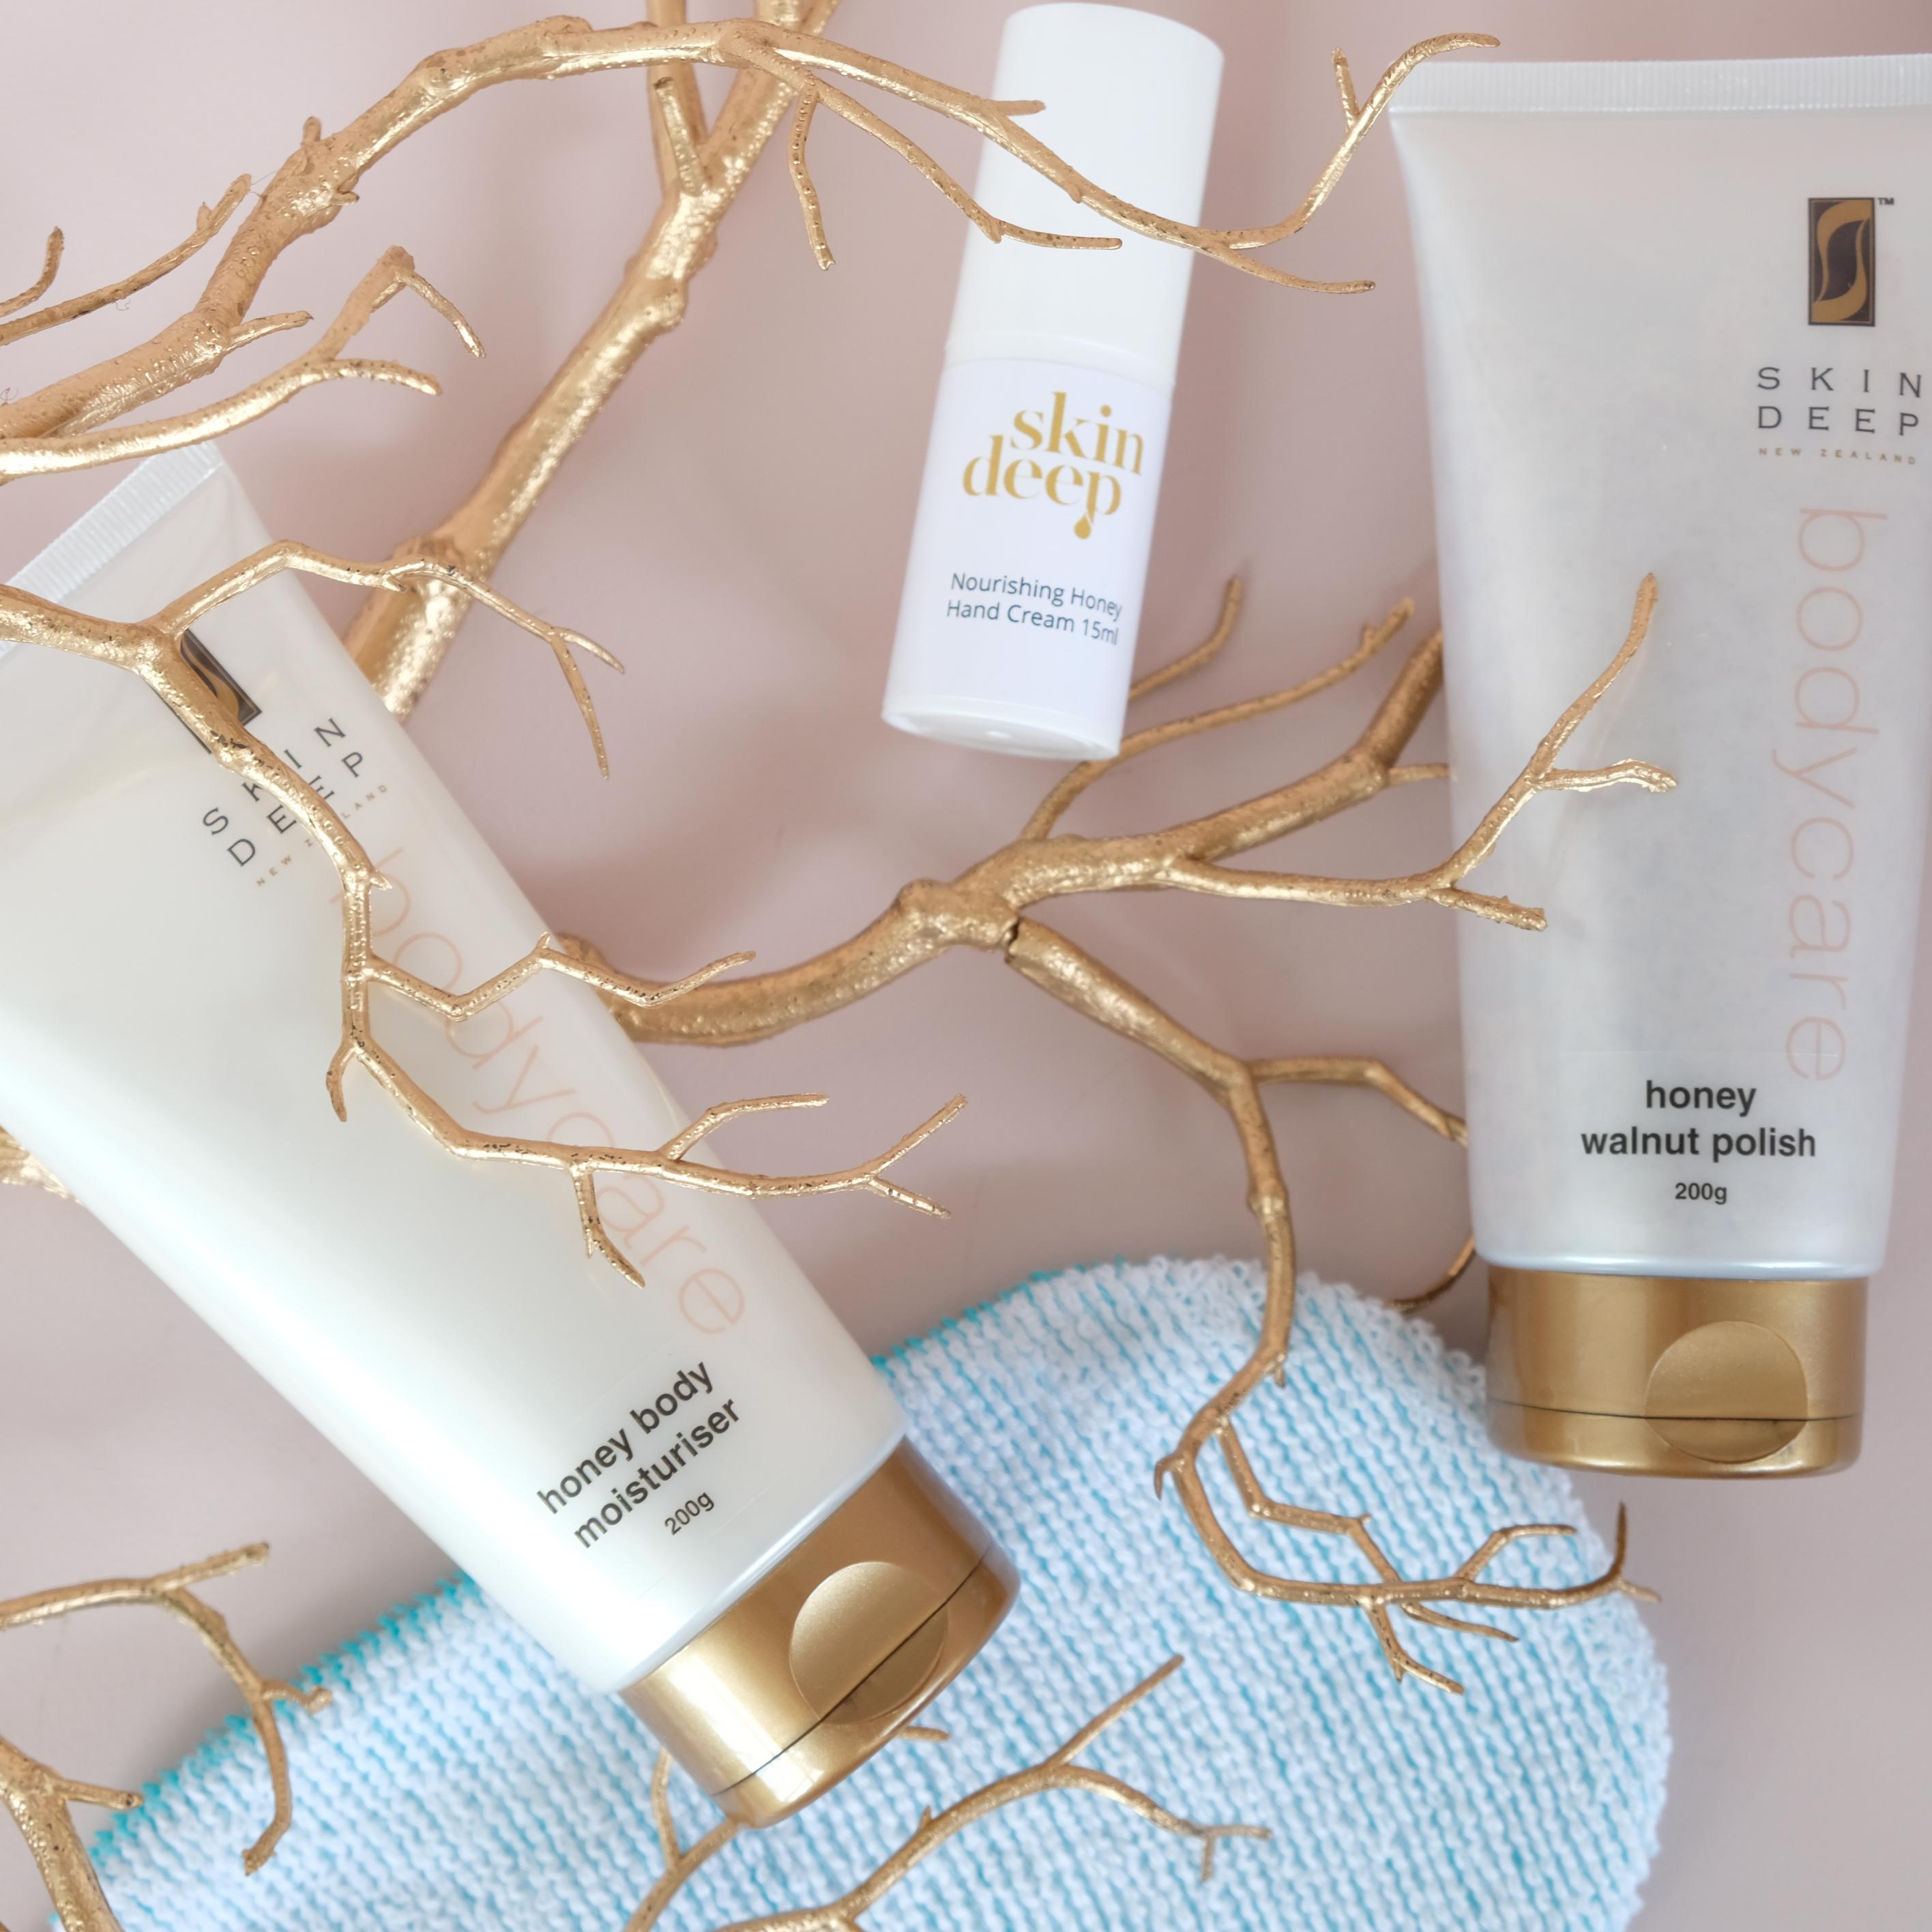 Skin Deep Ultimate Body Care Gift Set